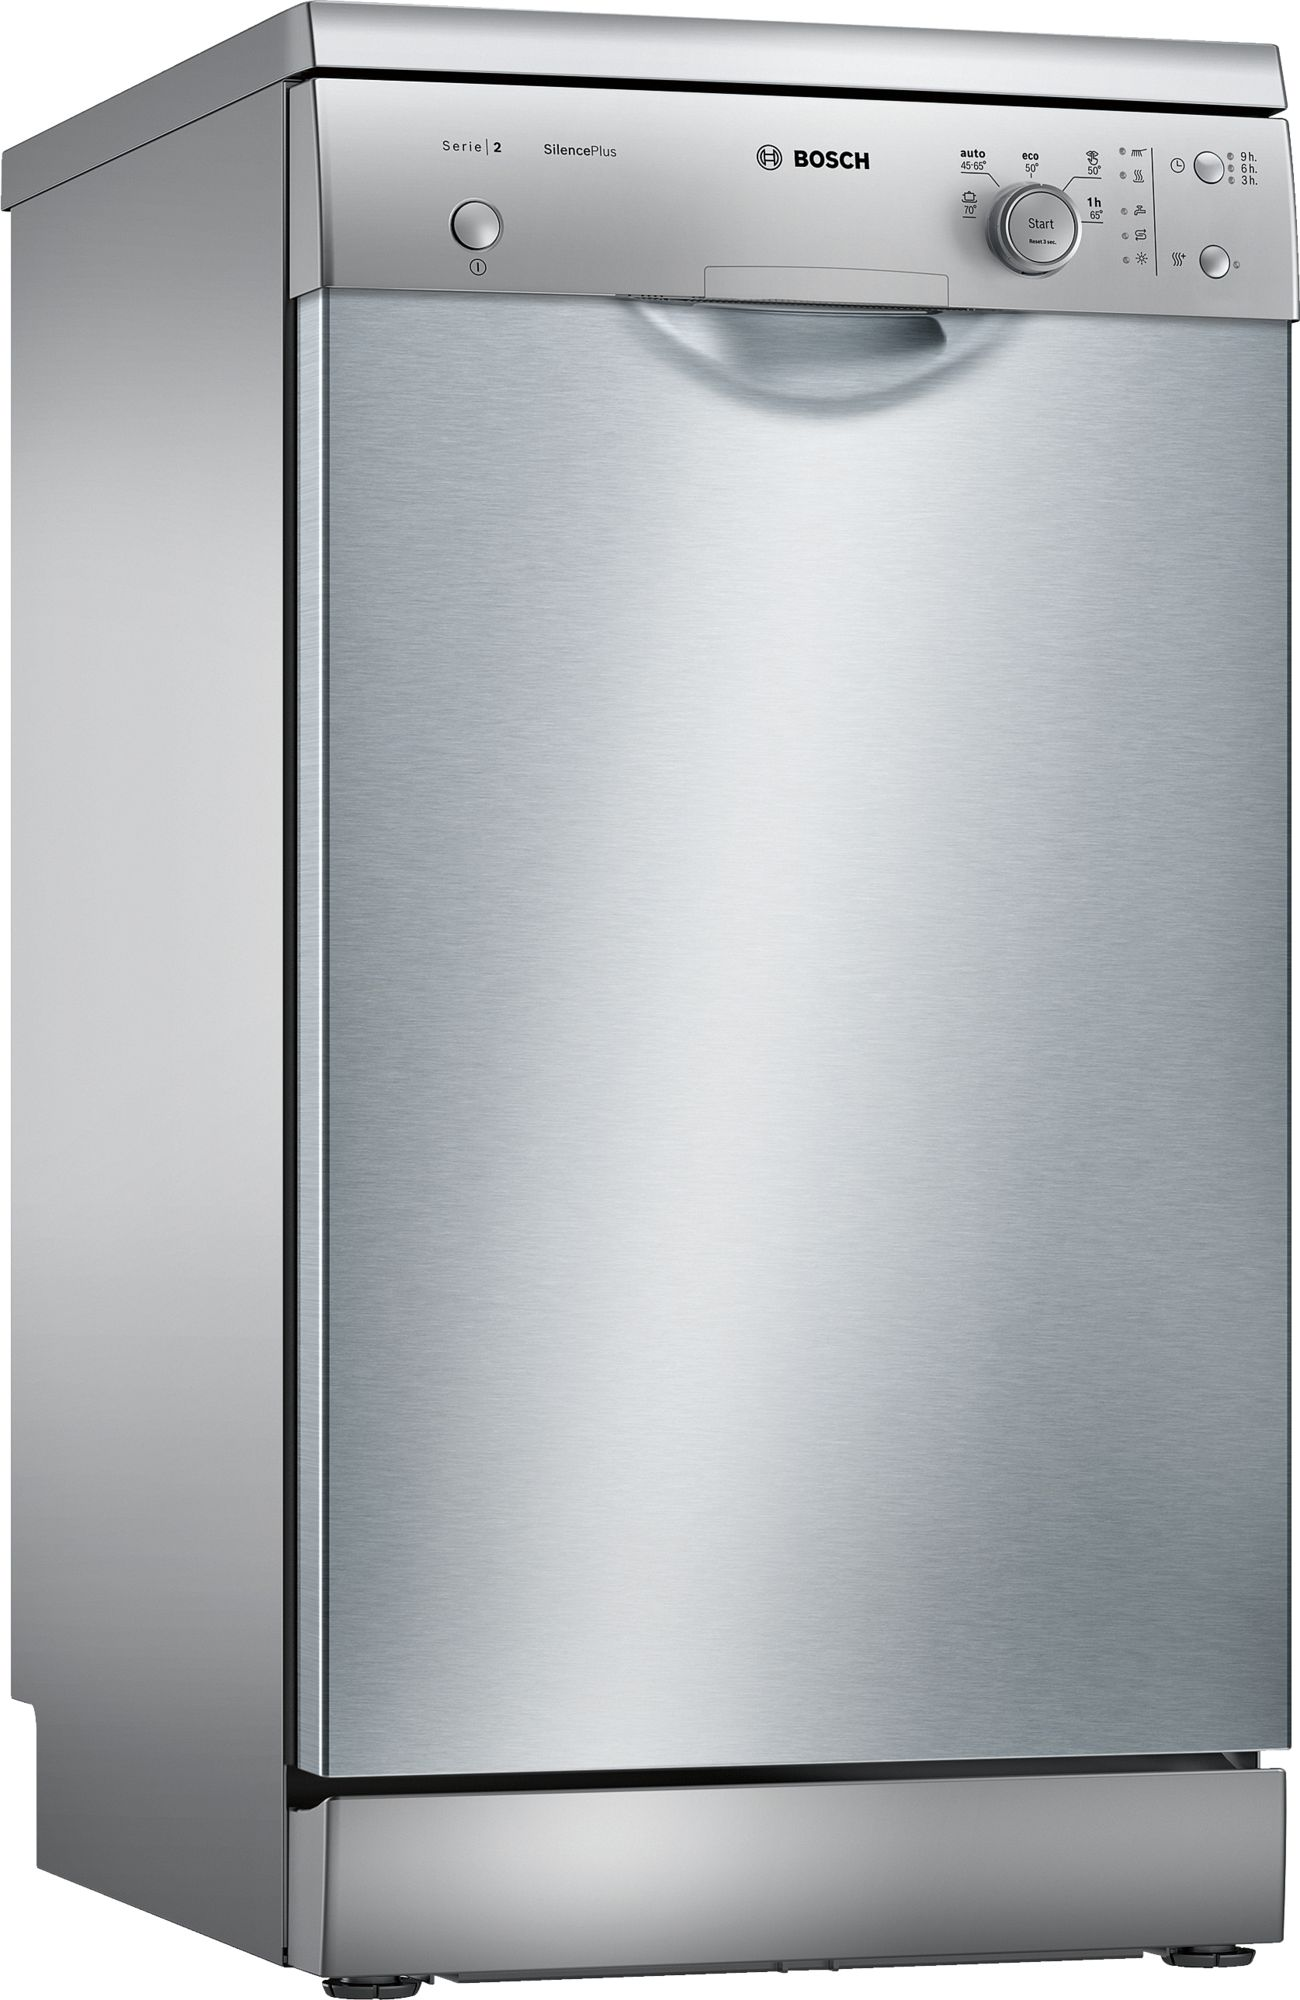 Serie | 2 Silence Plus mašina za pranje sudova, 45 cm samostalna mašina za pranje sudova, Silver inox